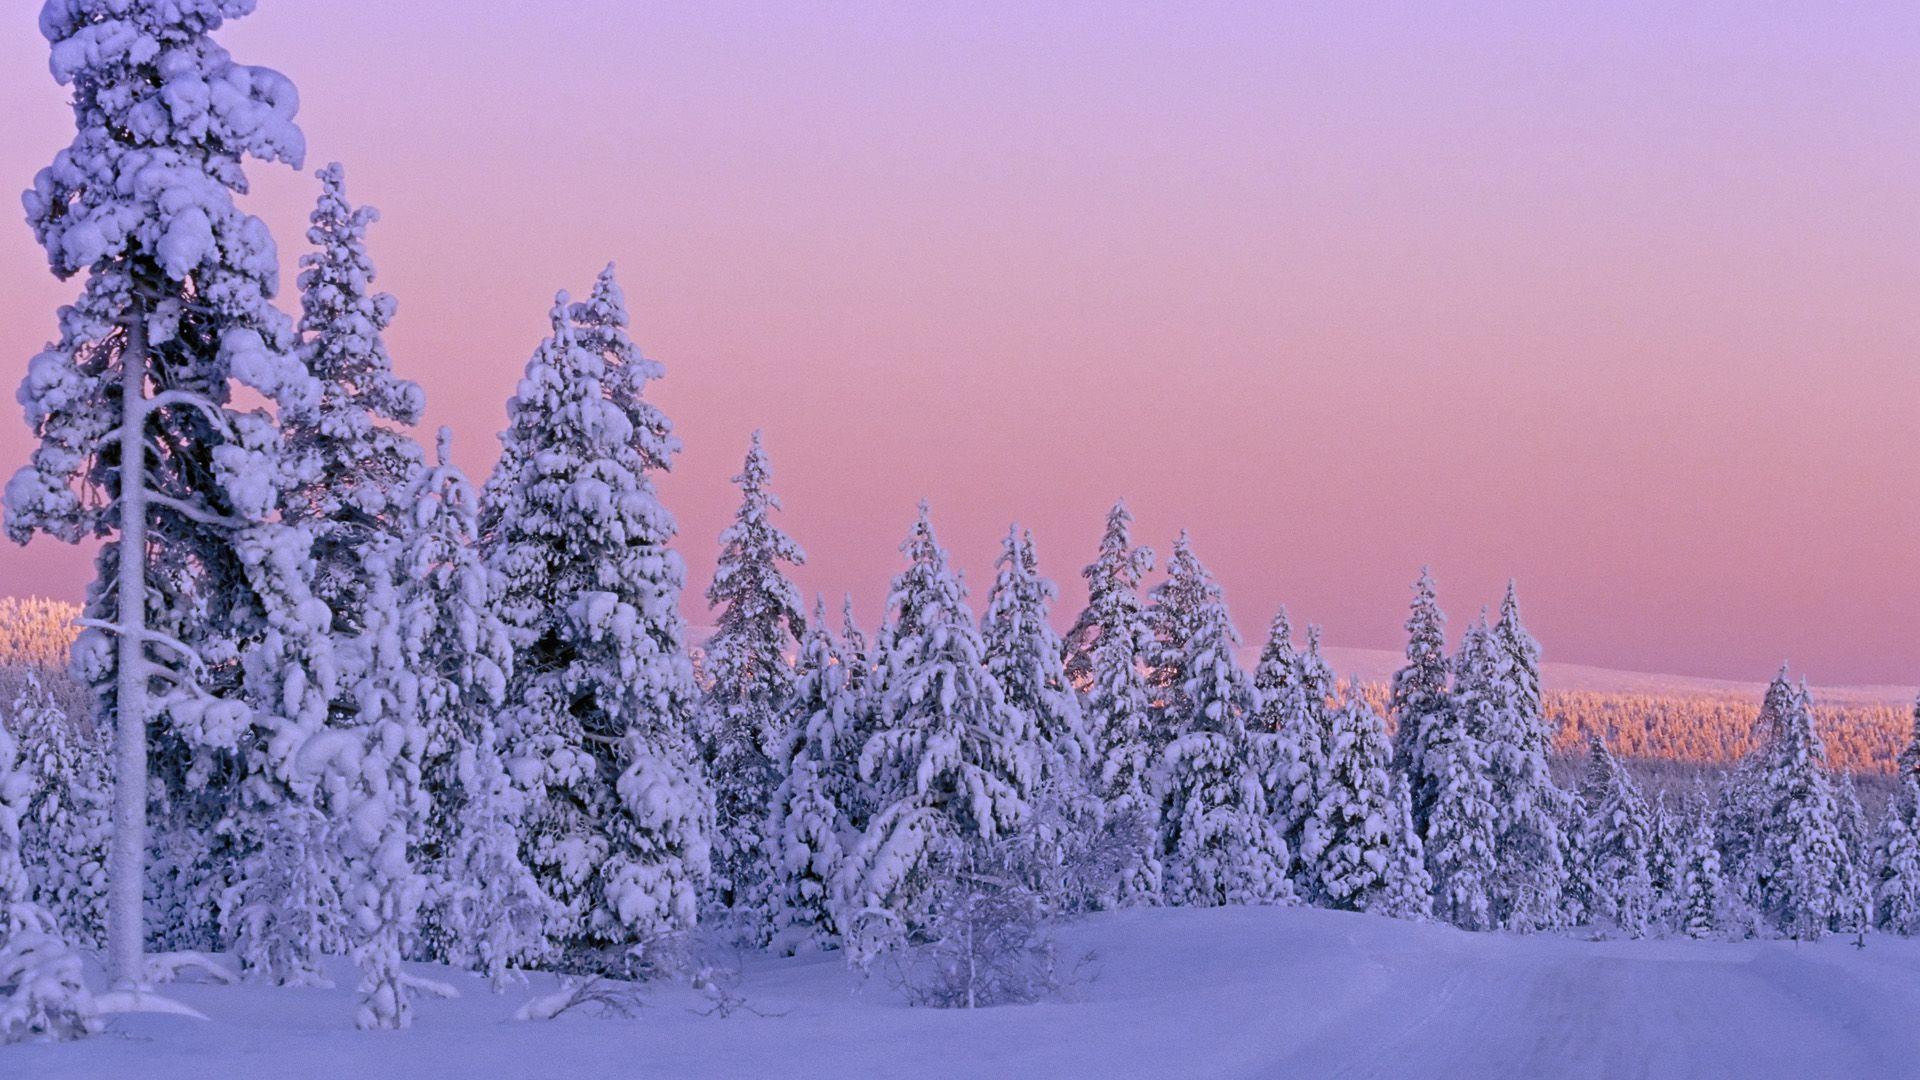 Winter Sunset Winter Snow Pictures Beautiful Winter Scenes Winter Wallpaper